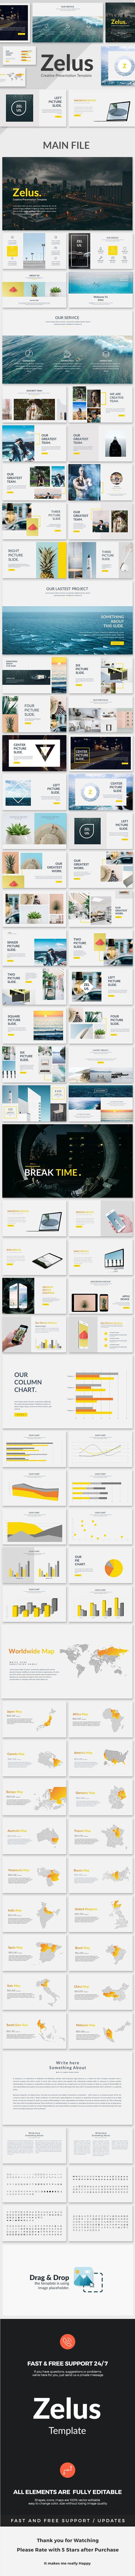 Zelus - Creative Google Slide Template